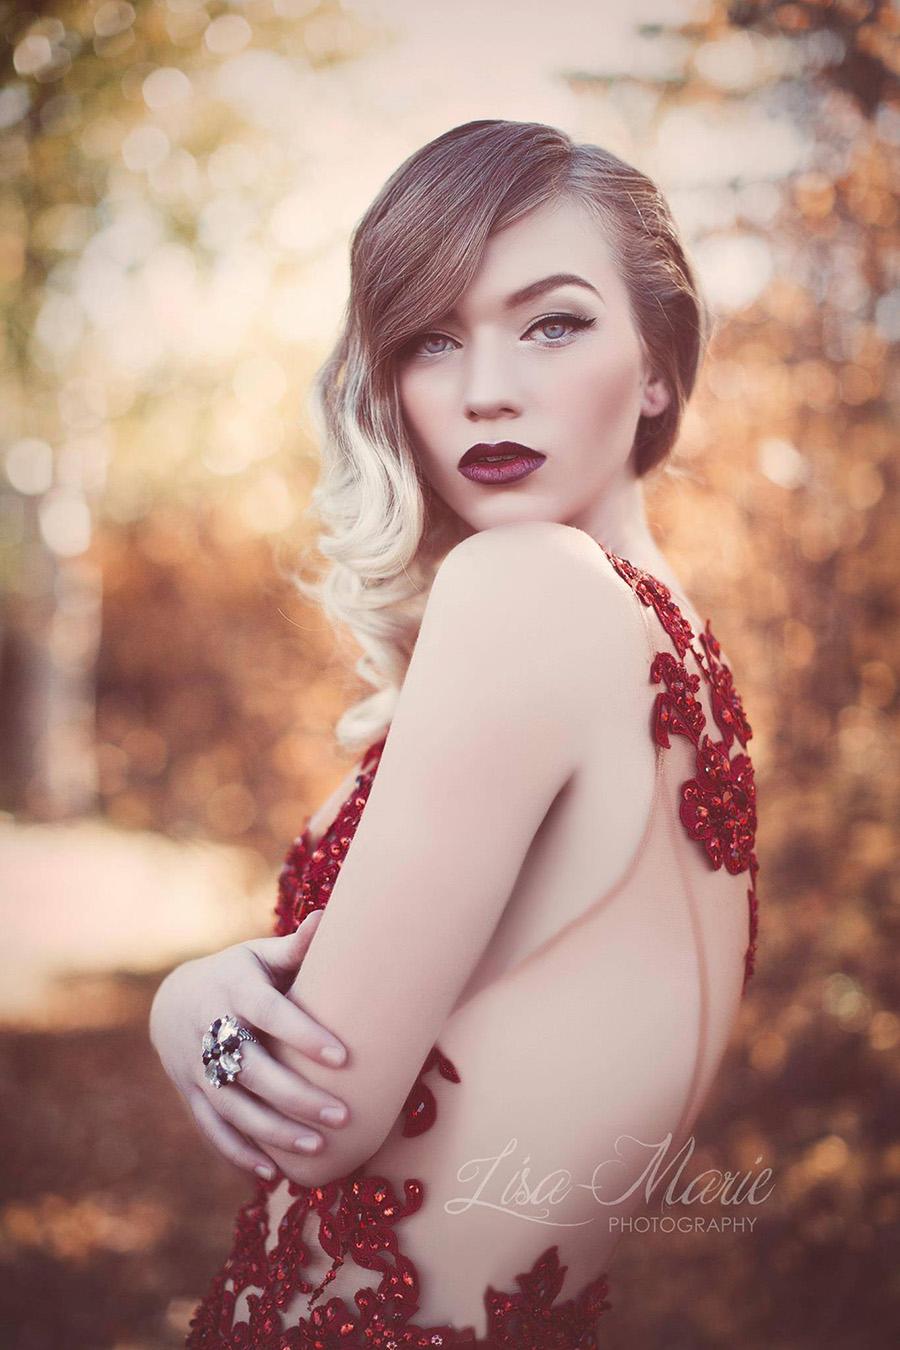 Lisa-Marie Photography - PS | Madison + Fashion Skin | Pro